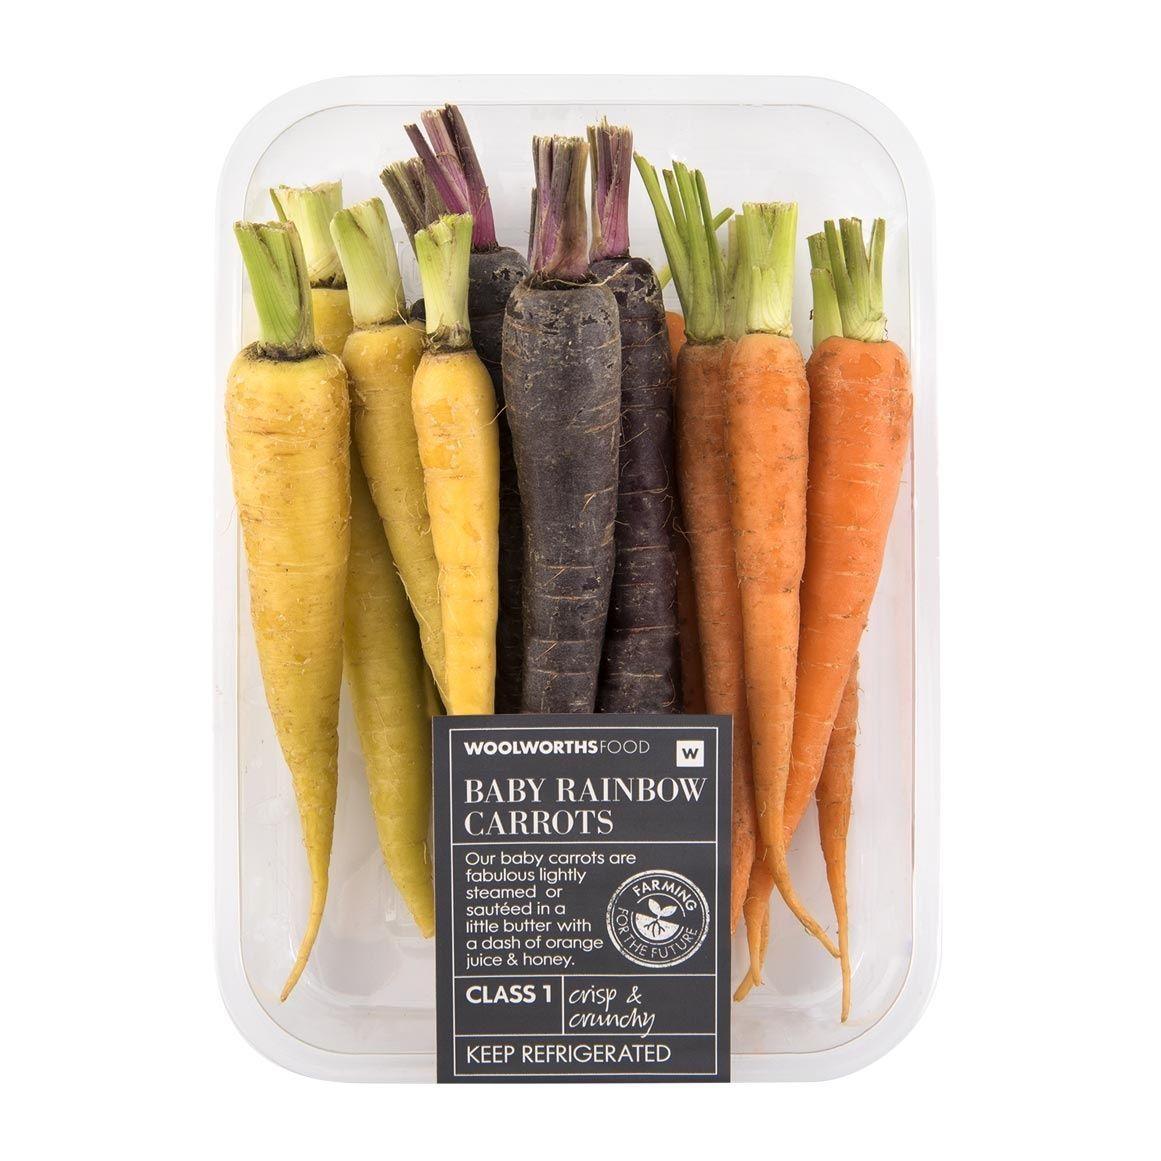 Baby Rainbow Carrots Min 200g Woolworths Co Za Carrots Rainbow Carrots Seasoning Recipes